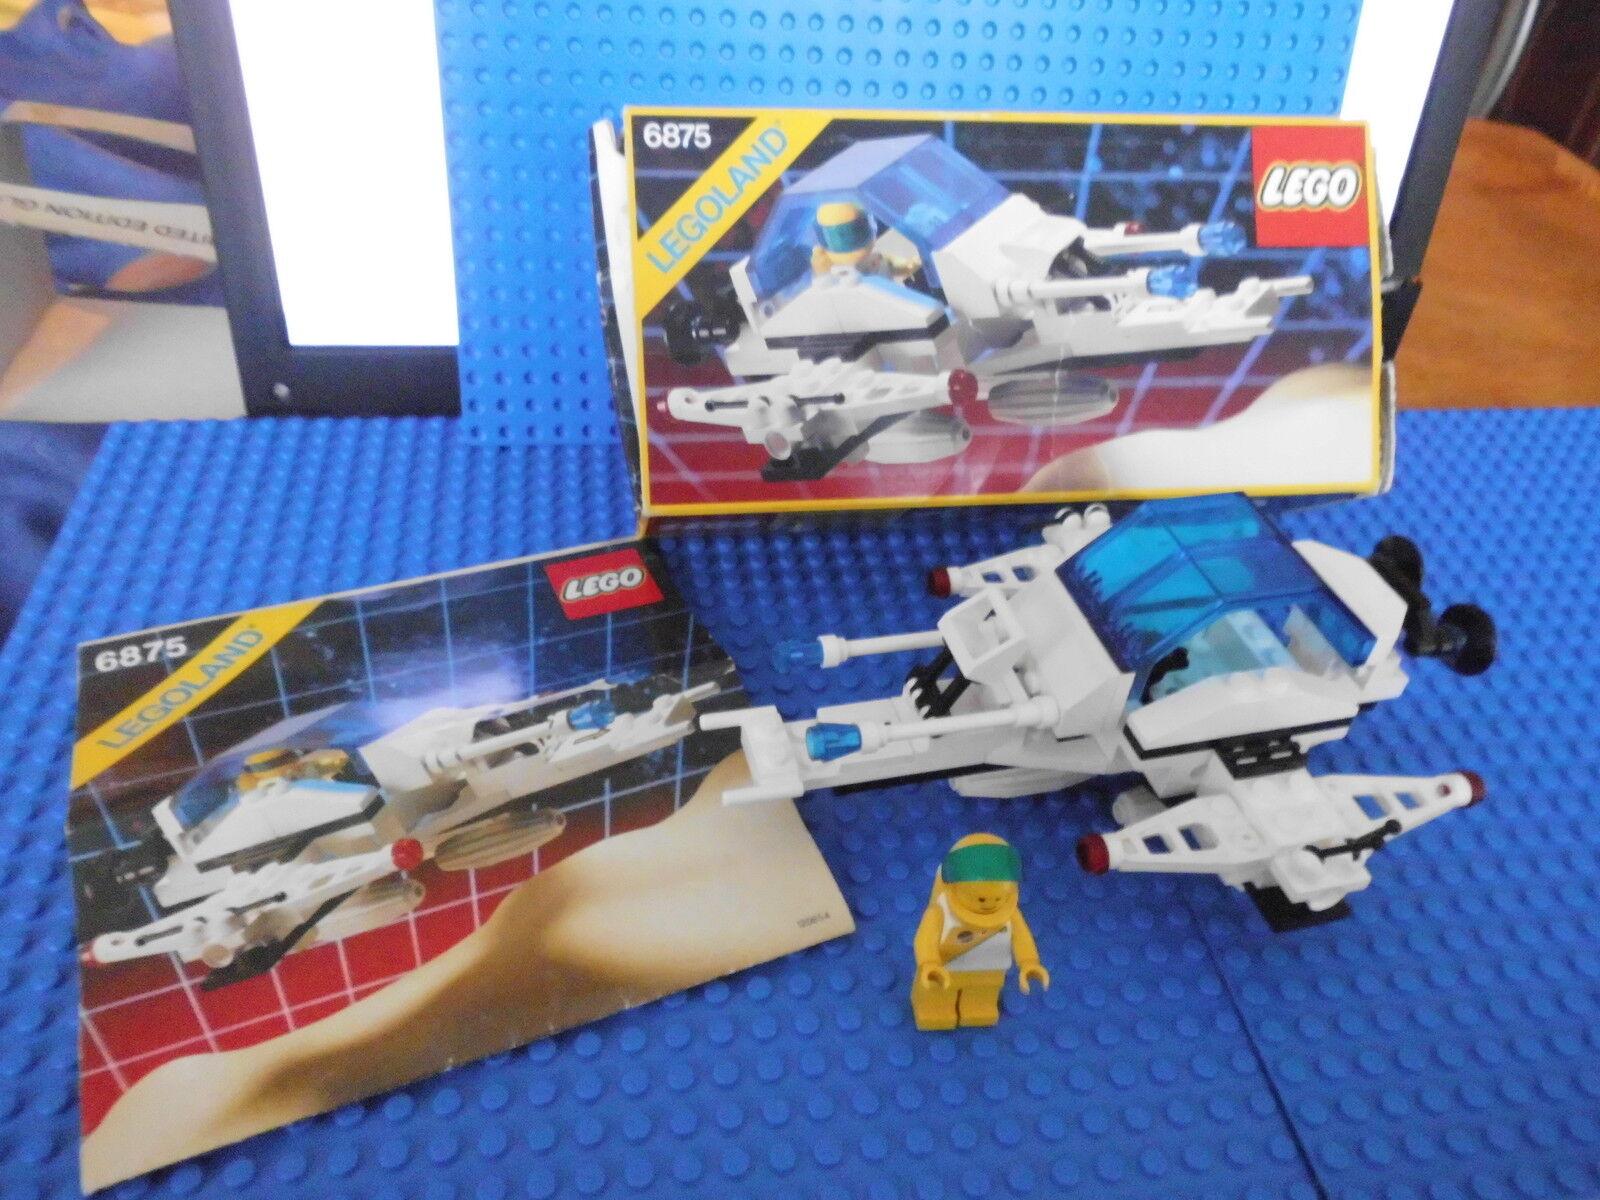 LEGO - 6875 - Space Futuron - Hovercraft 1988 KOMPLETT inkl. OBA und OVP